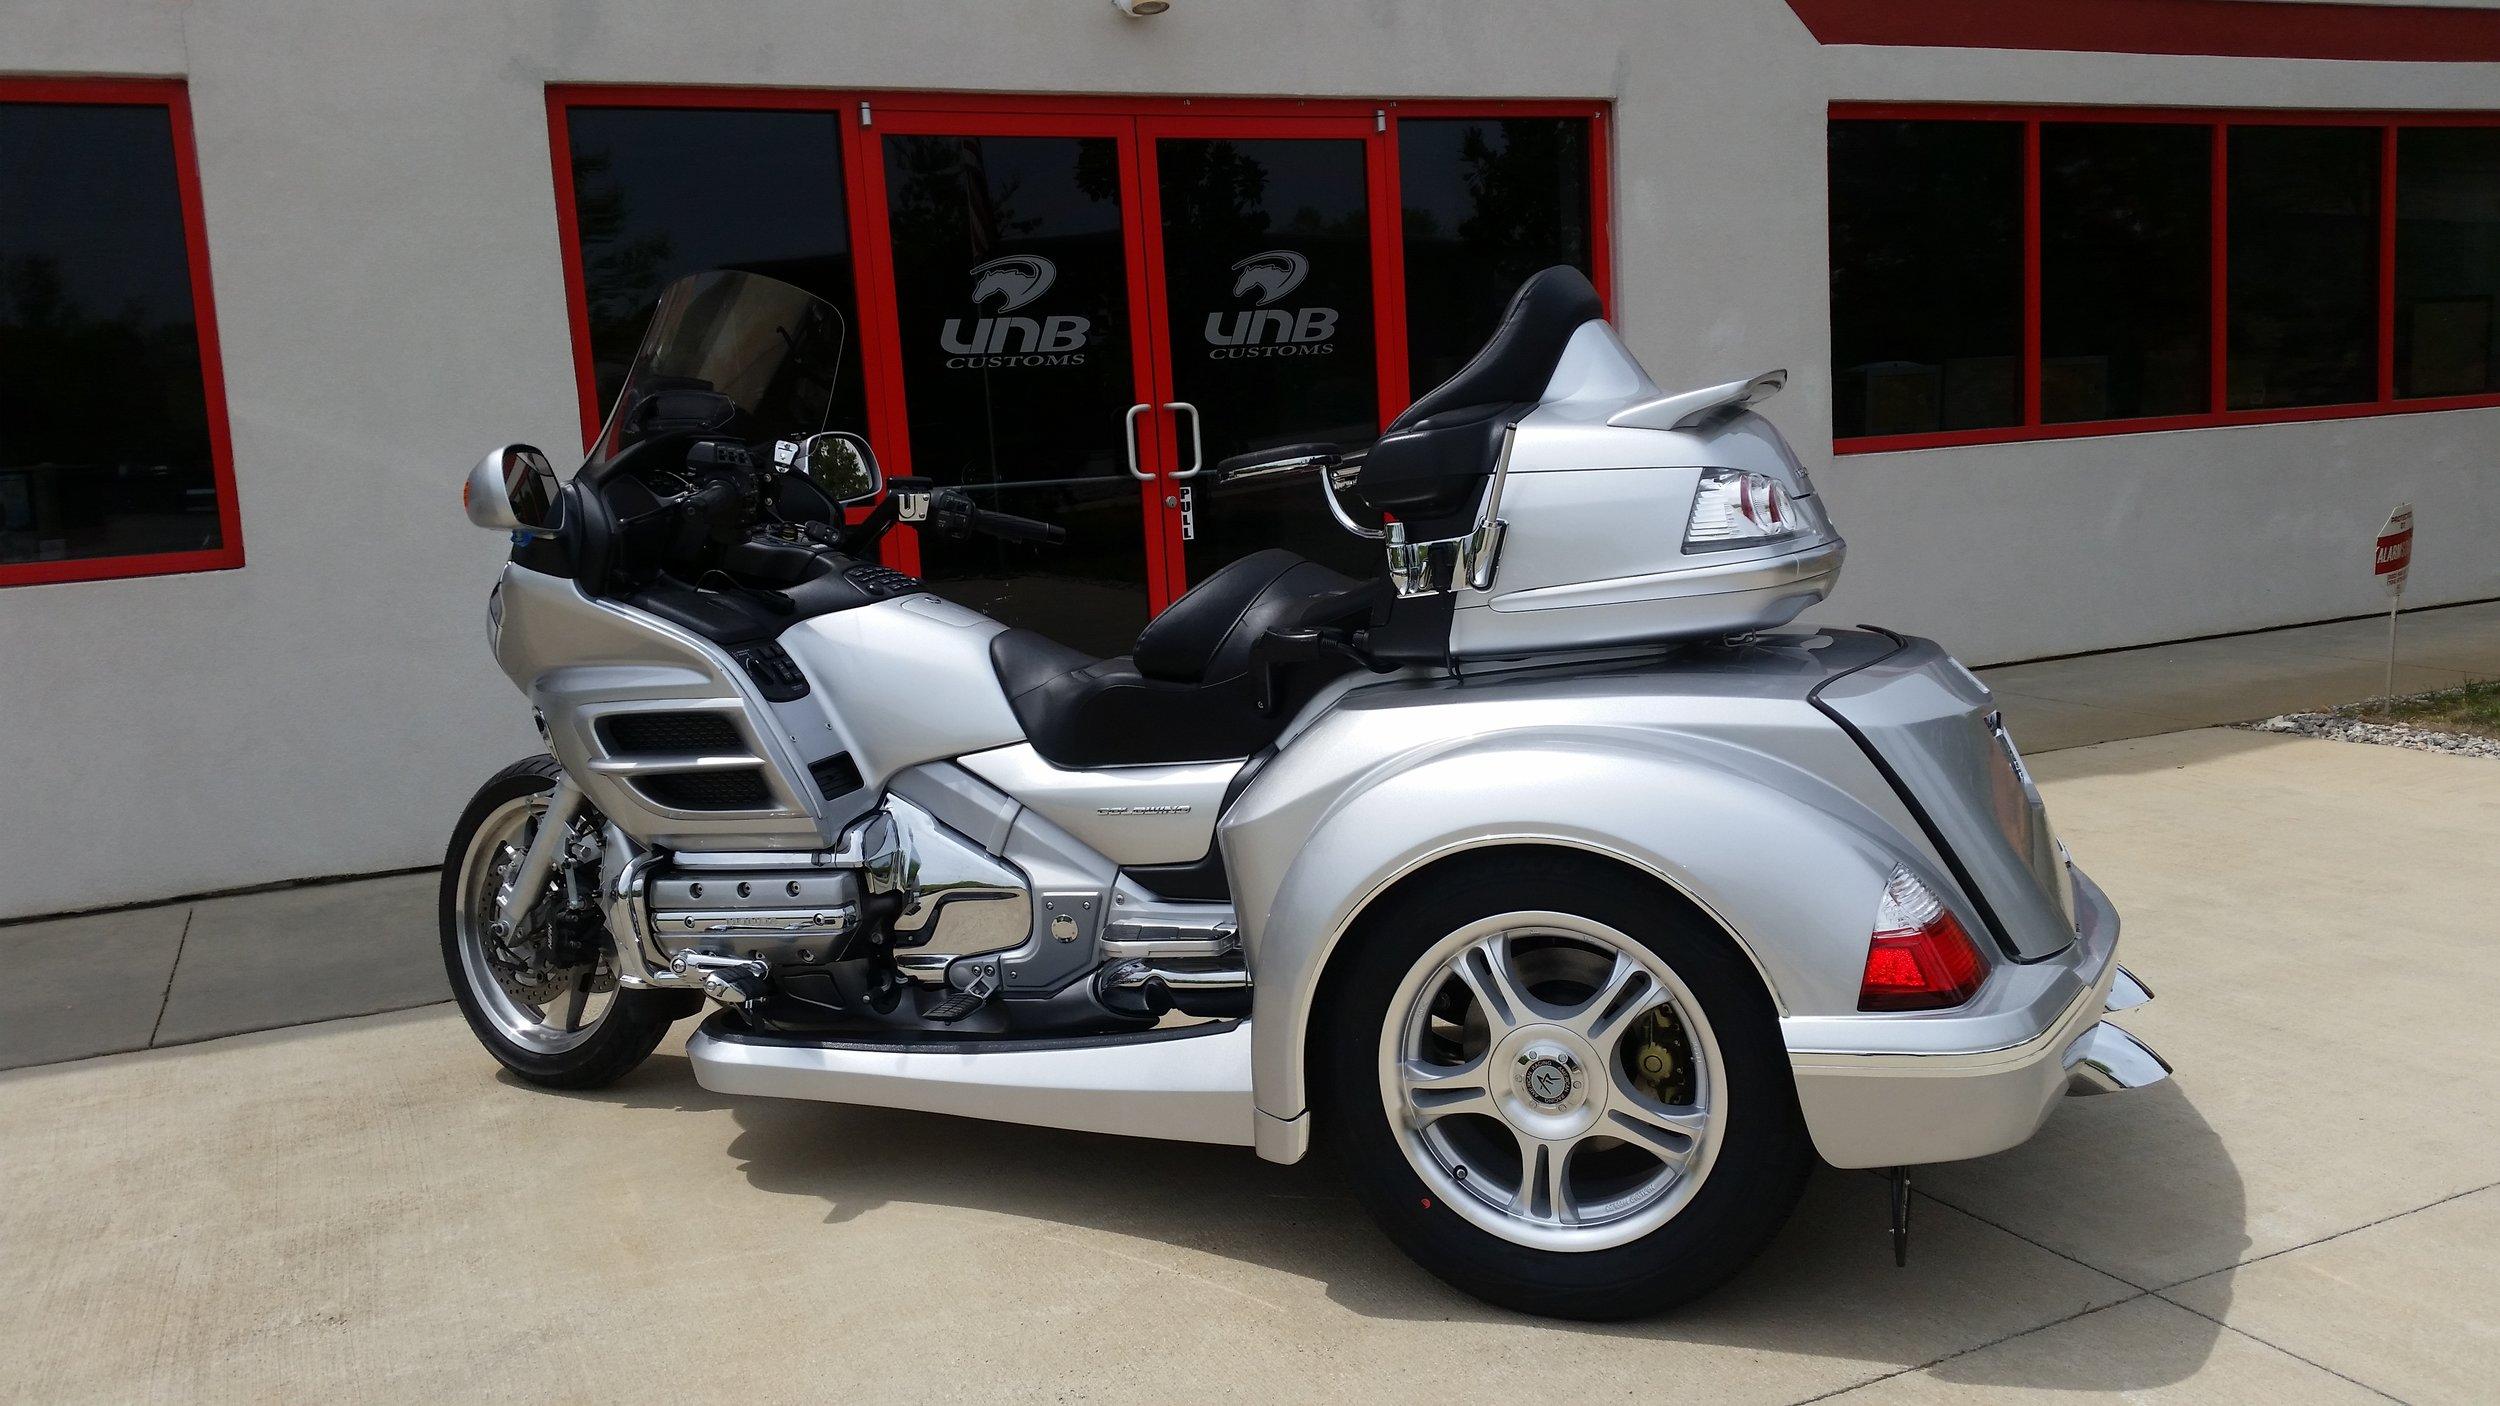 Honda Goldwing 1800 Roadsmith trike conversion (silver)